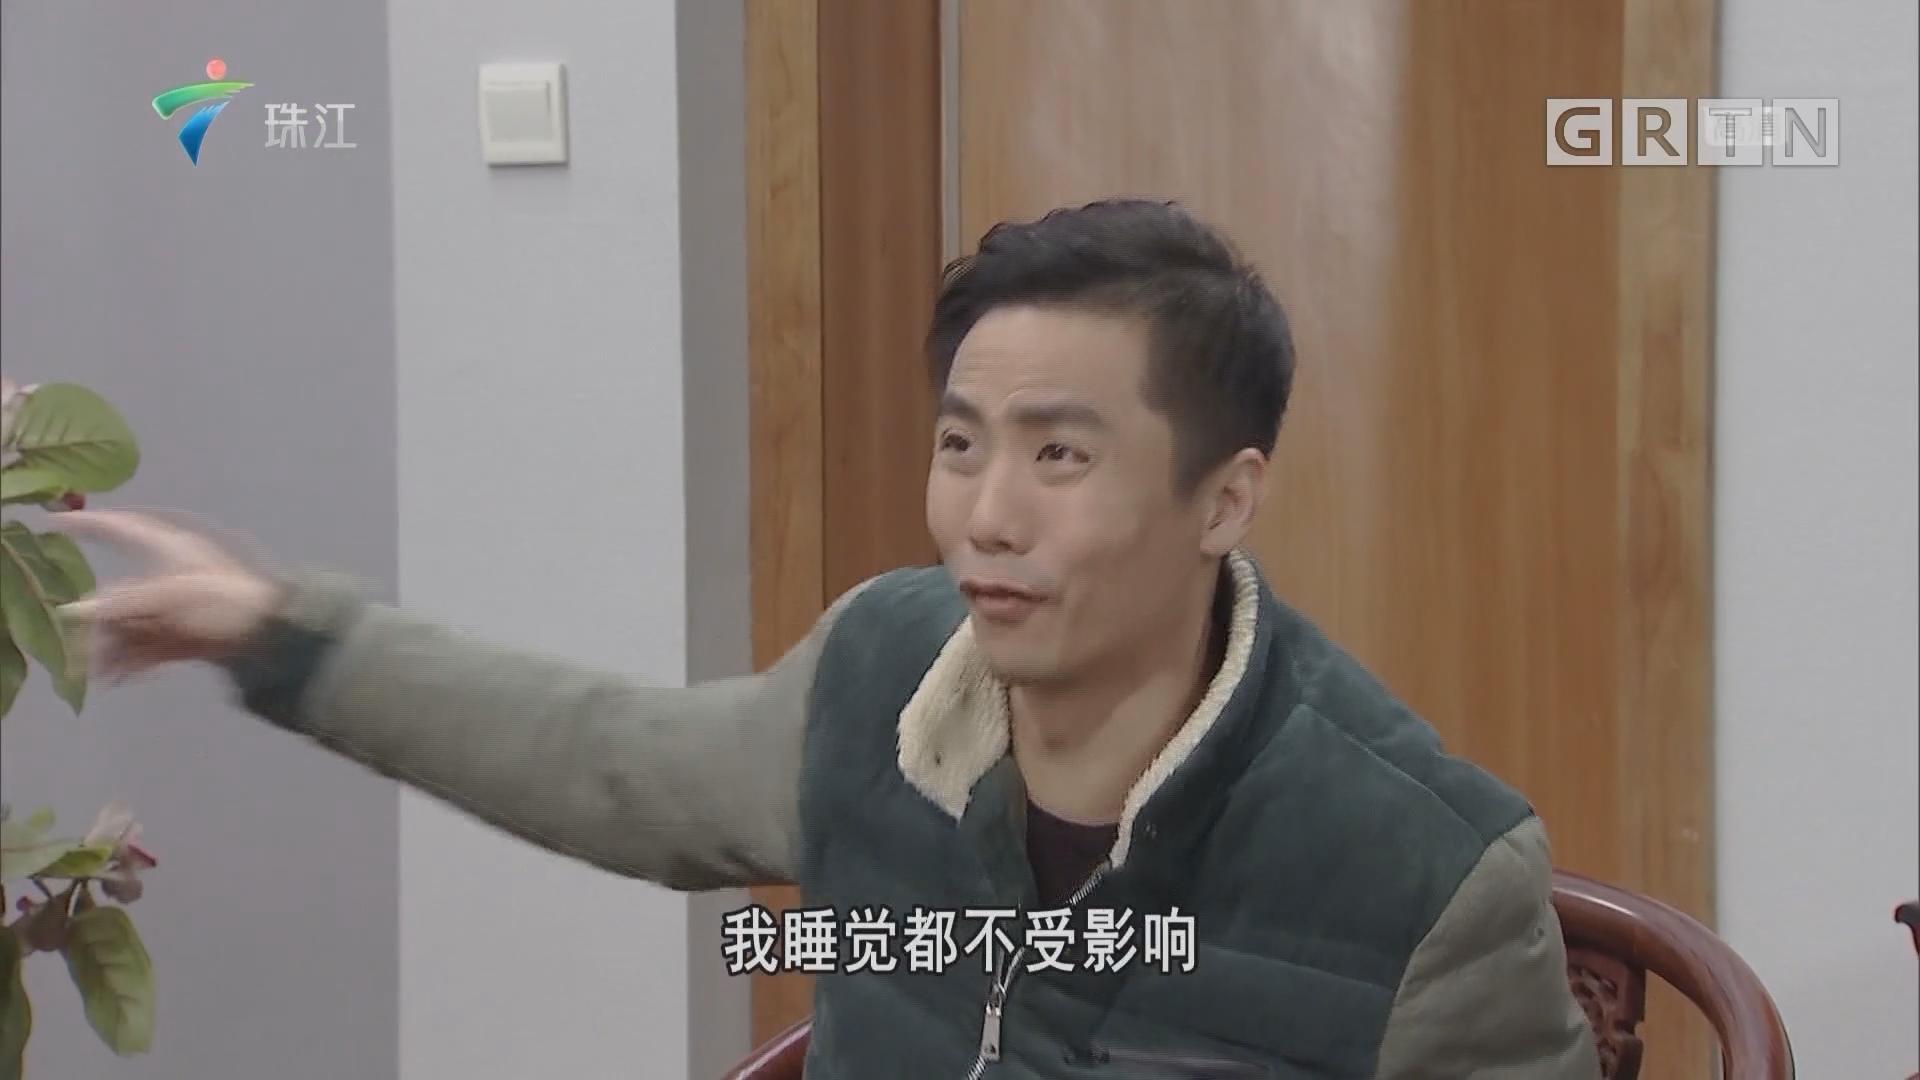 [HD][2019-02-10]外来媳妇本地郎:地铁情缘(四)